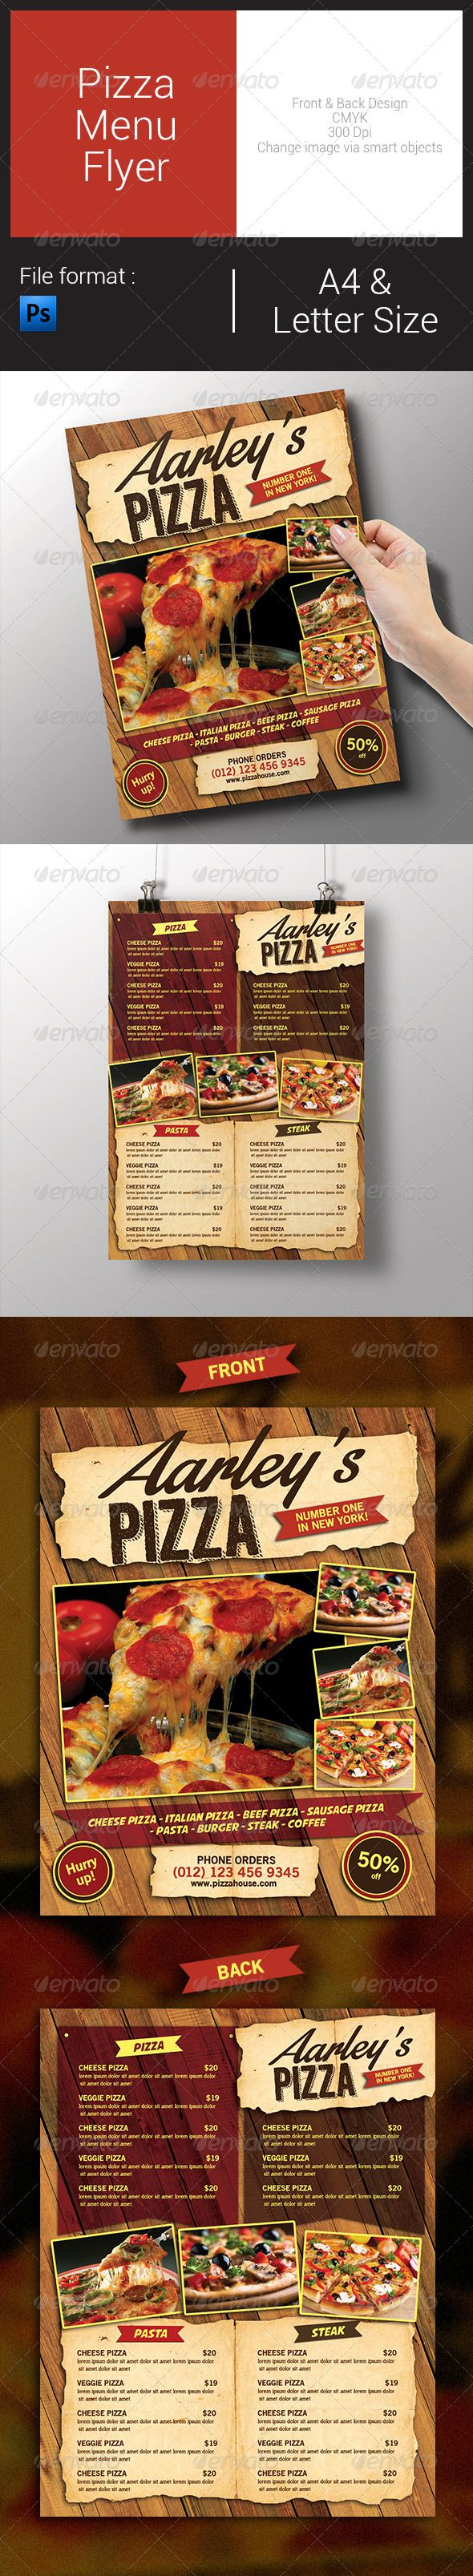 Lost pizza cafe menu